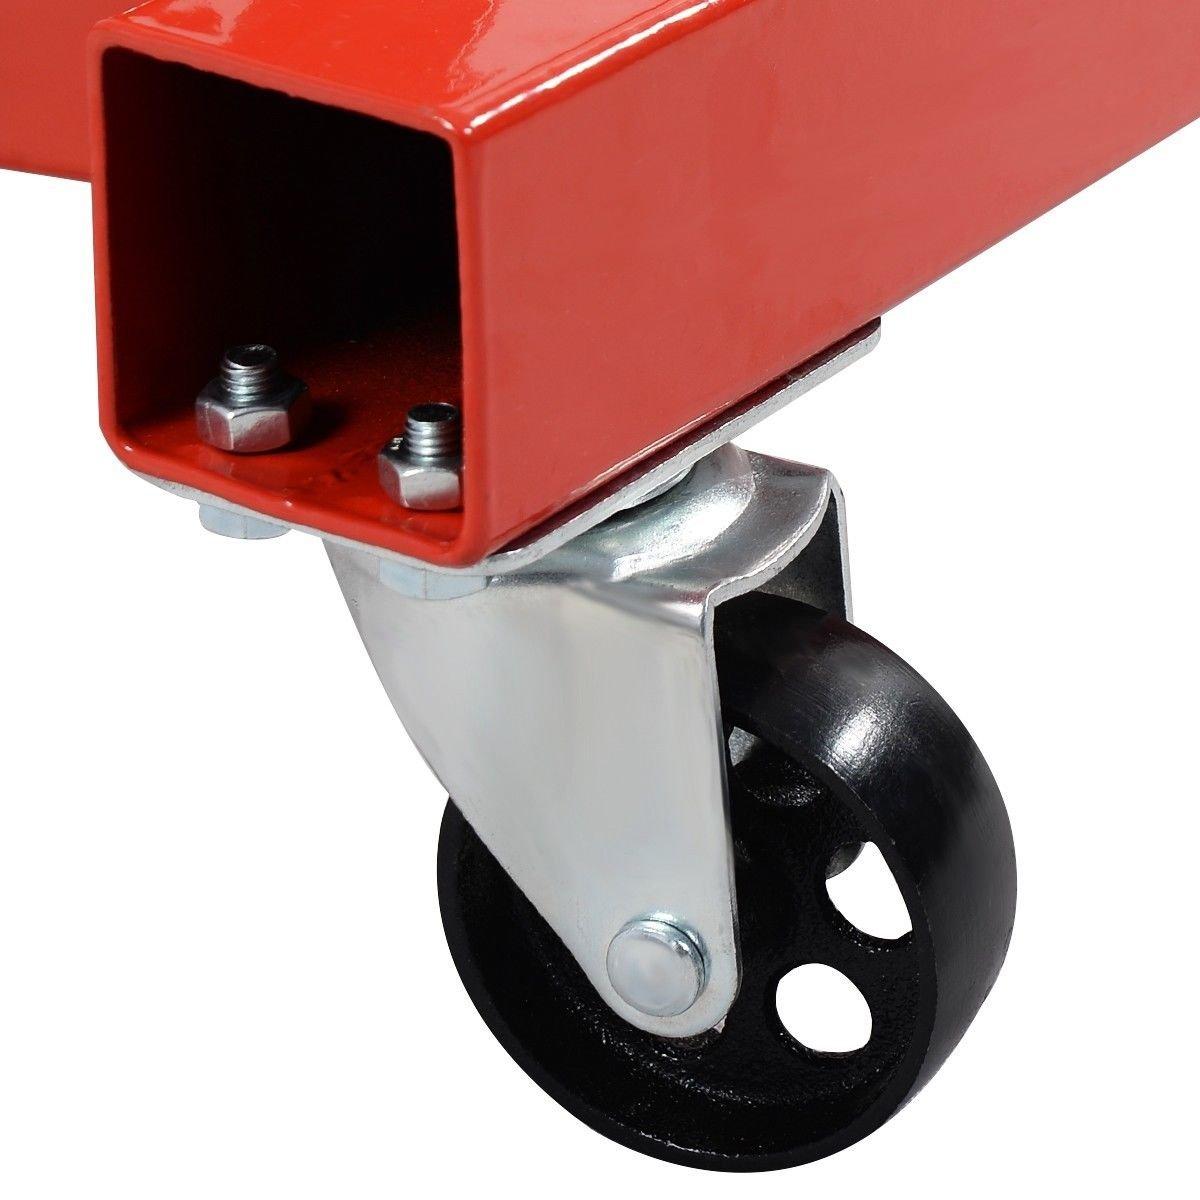 Goplus Engine Stand Motor Hoist Auto Car Truck Automotive Jack (2000-lb Capacity) by Goplus (Image #5)